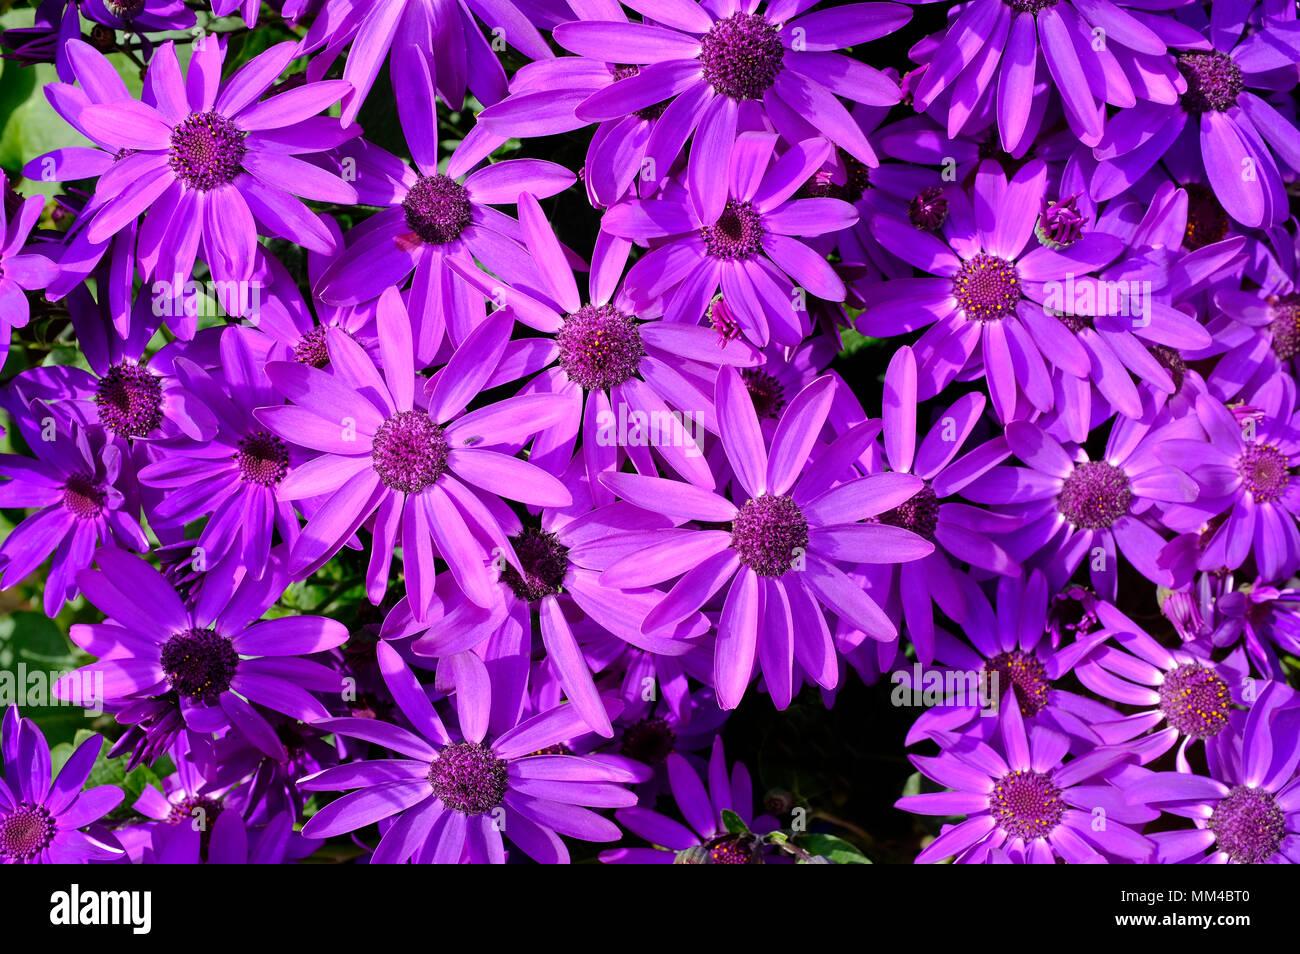 purple flowering senetti flowers, norfolk, england - Stock Image